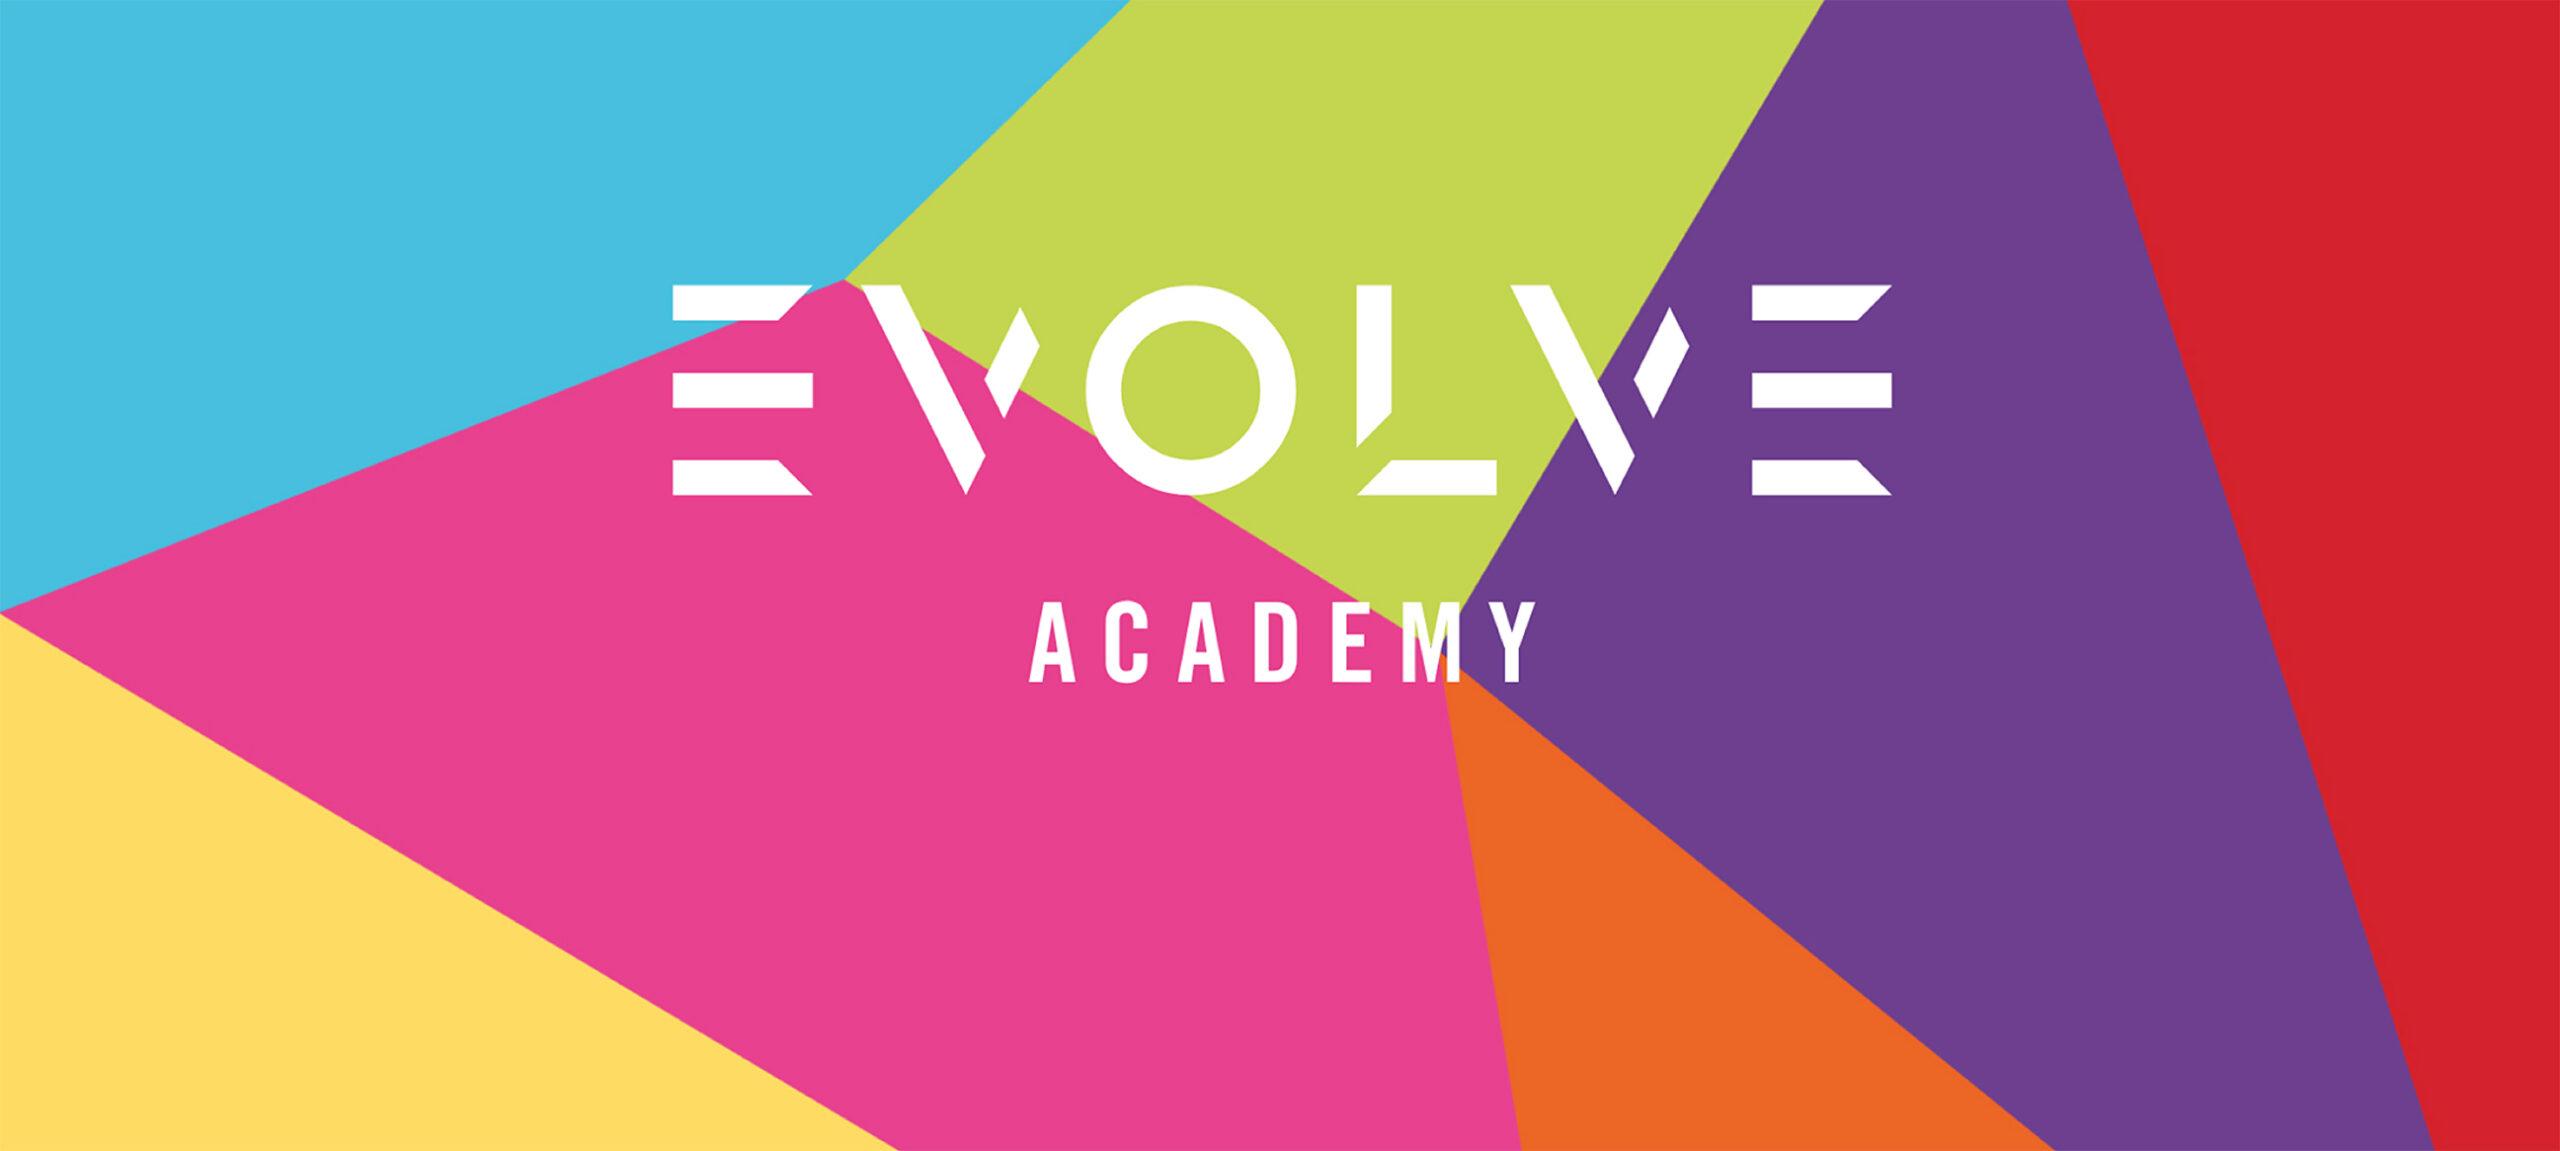 Evolve Academy Open Event